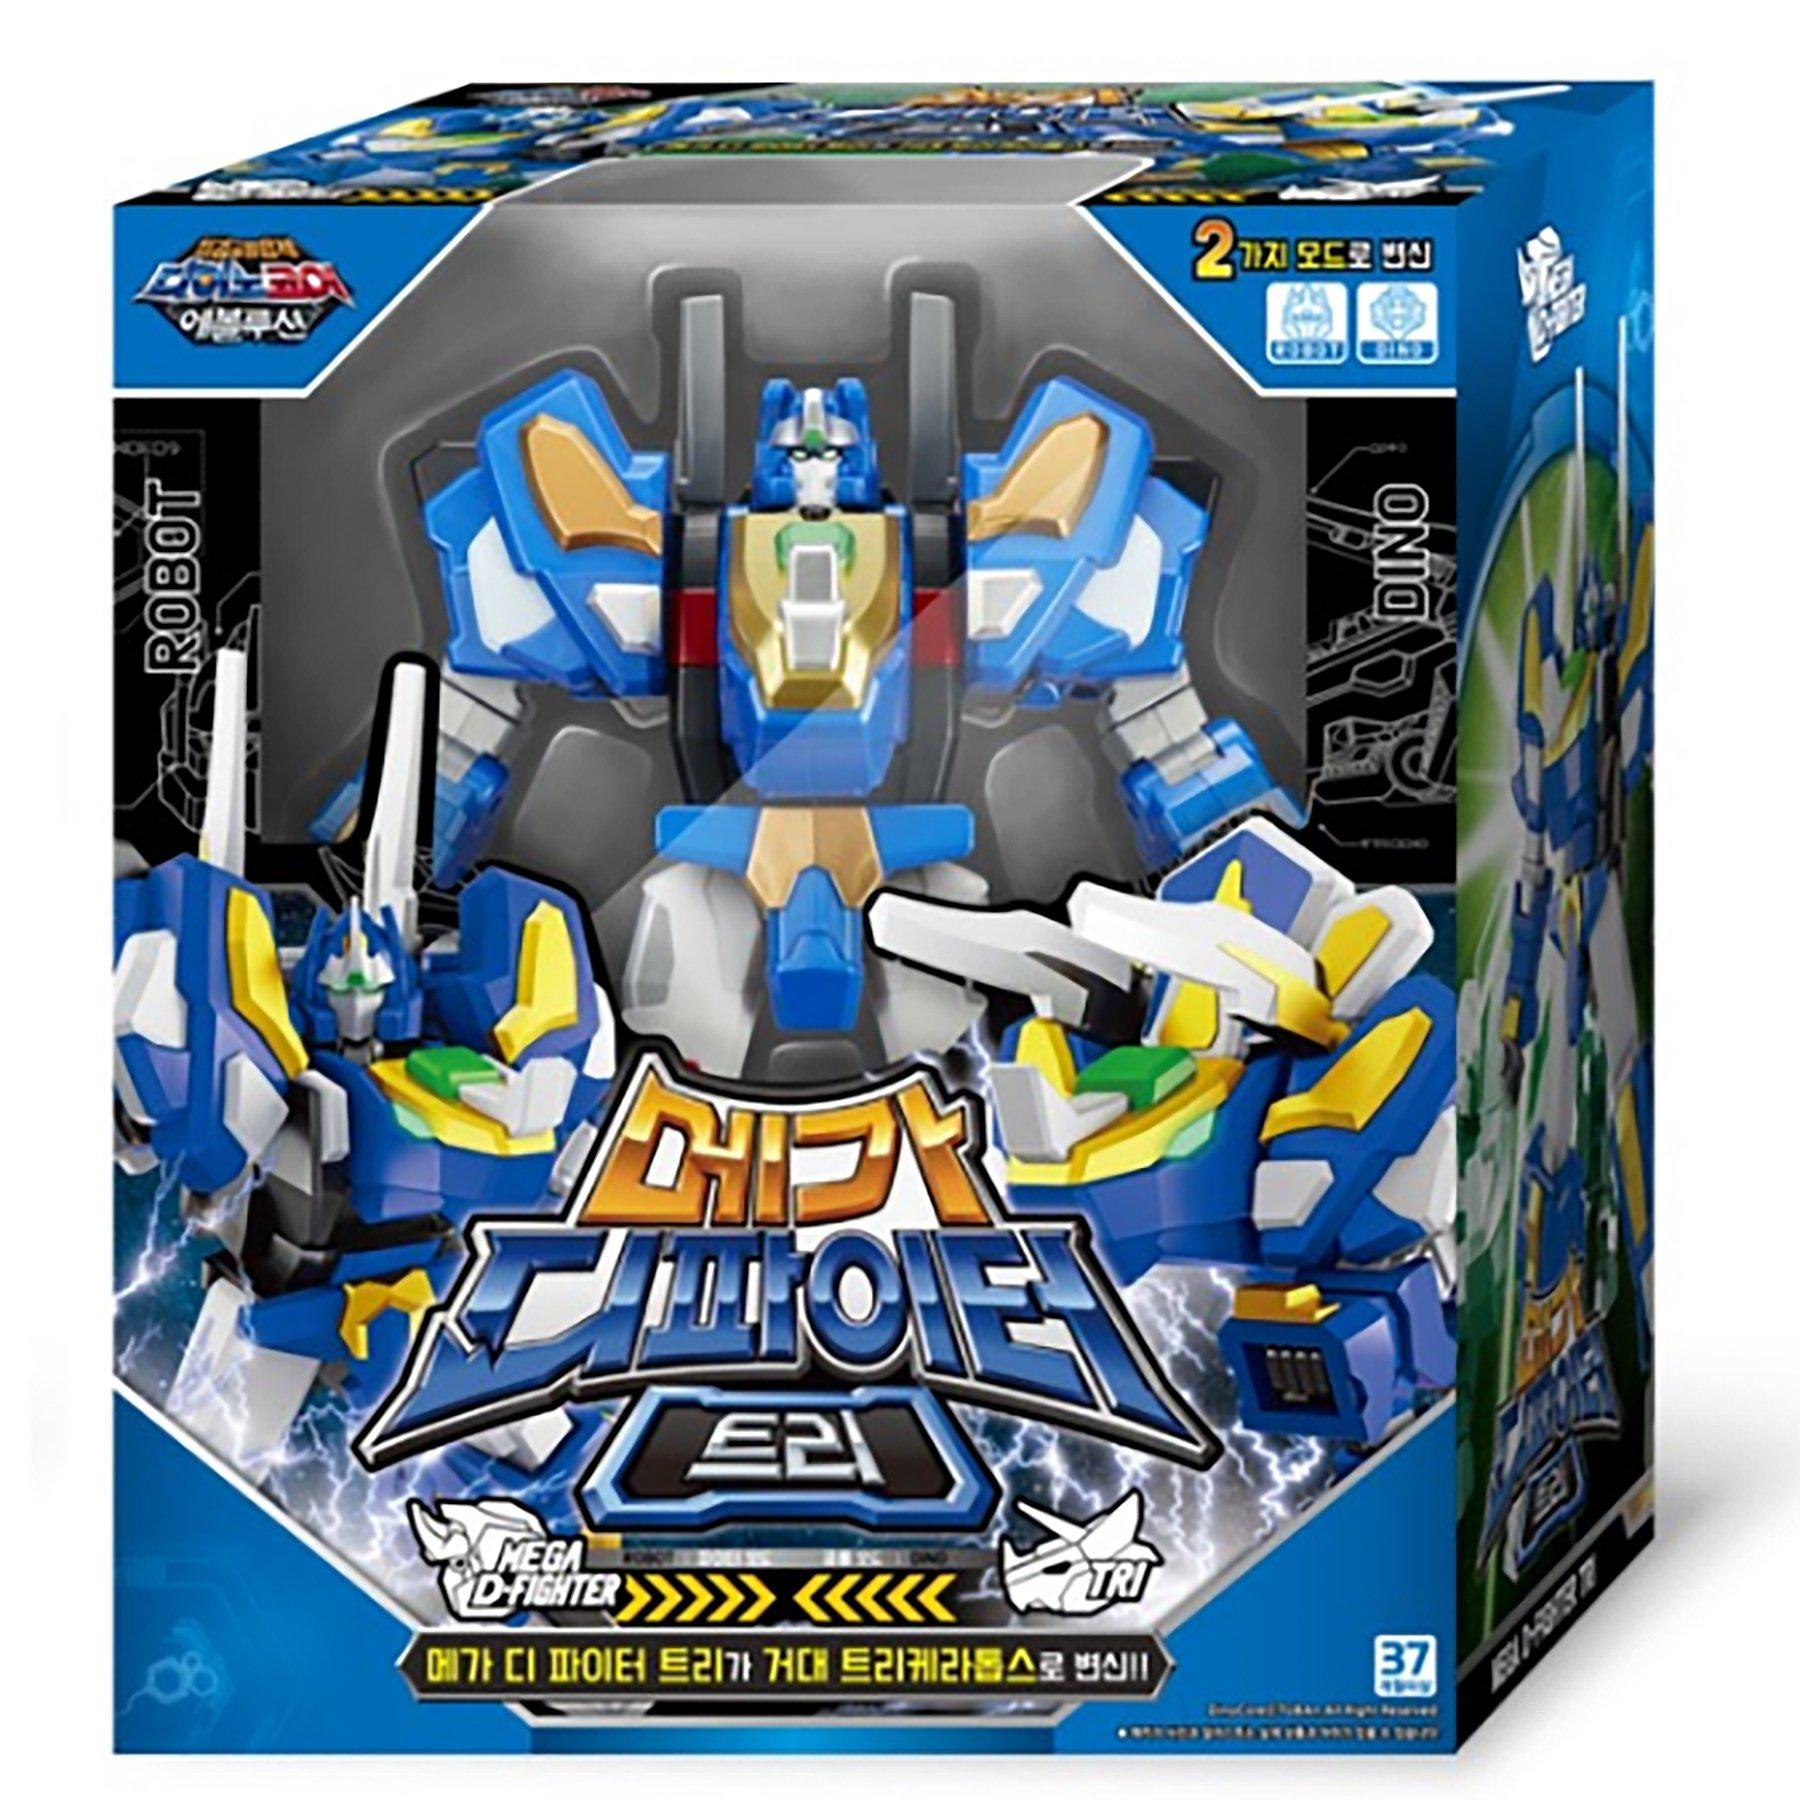 Dino Core Season 4 Evolution Mega D-Fighter TRI Transforming Robot Toy